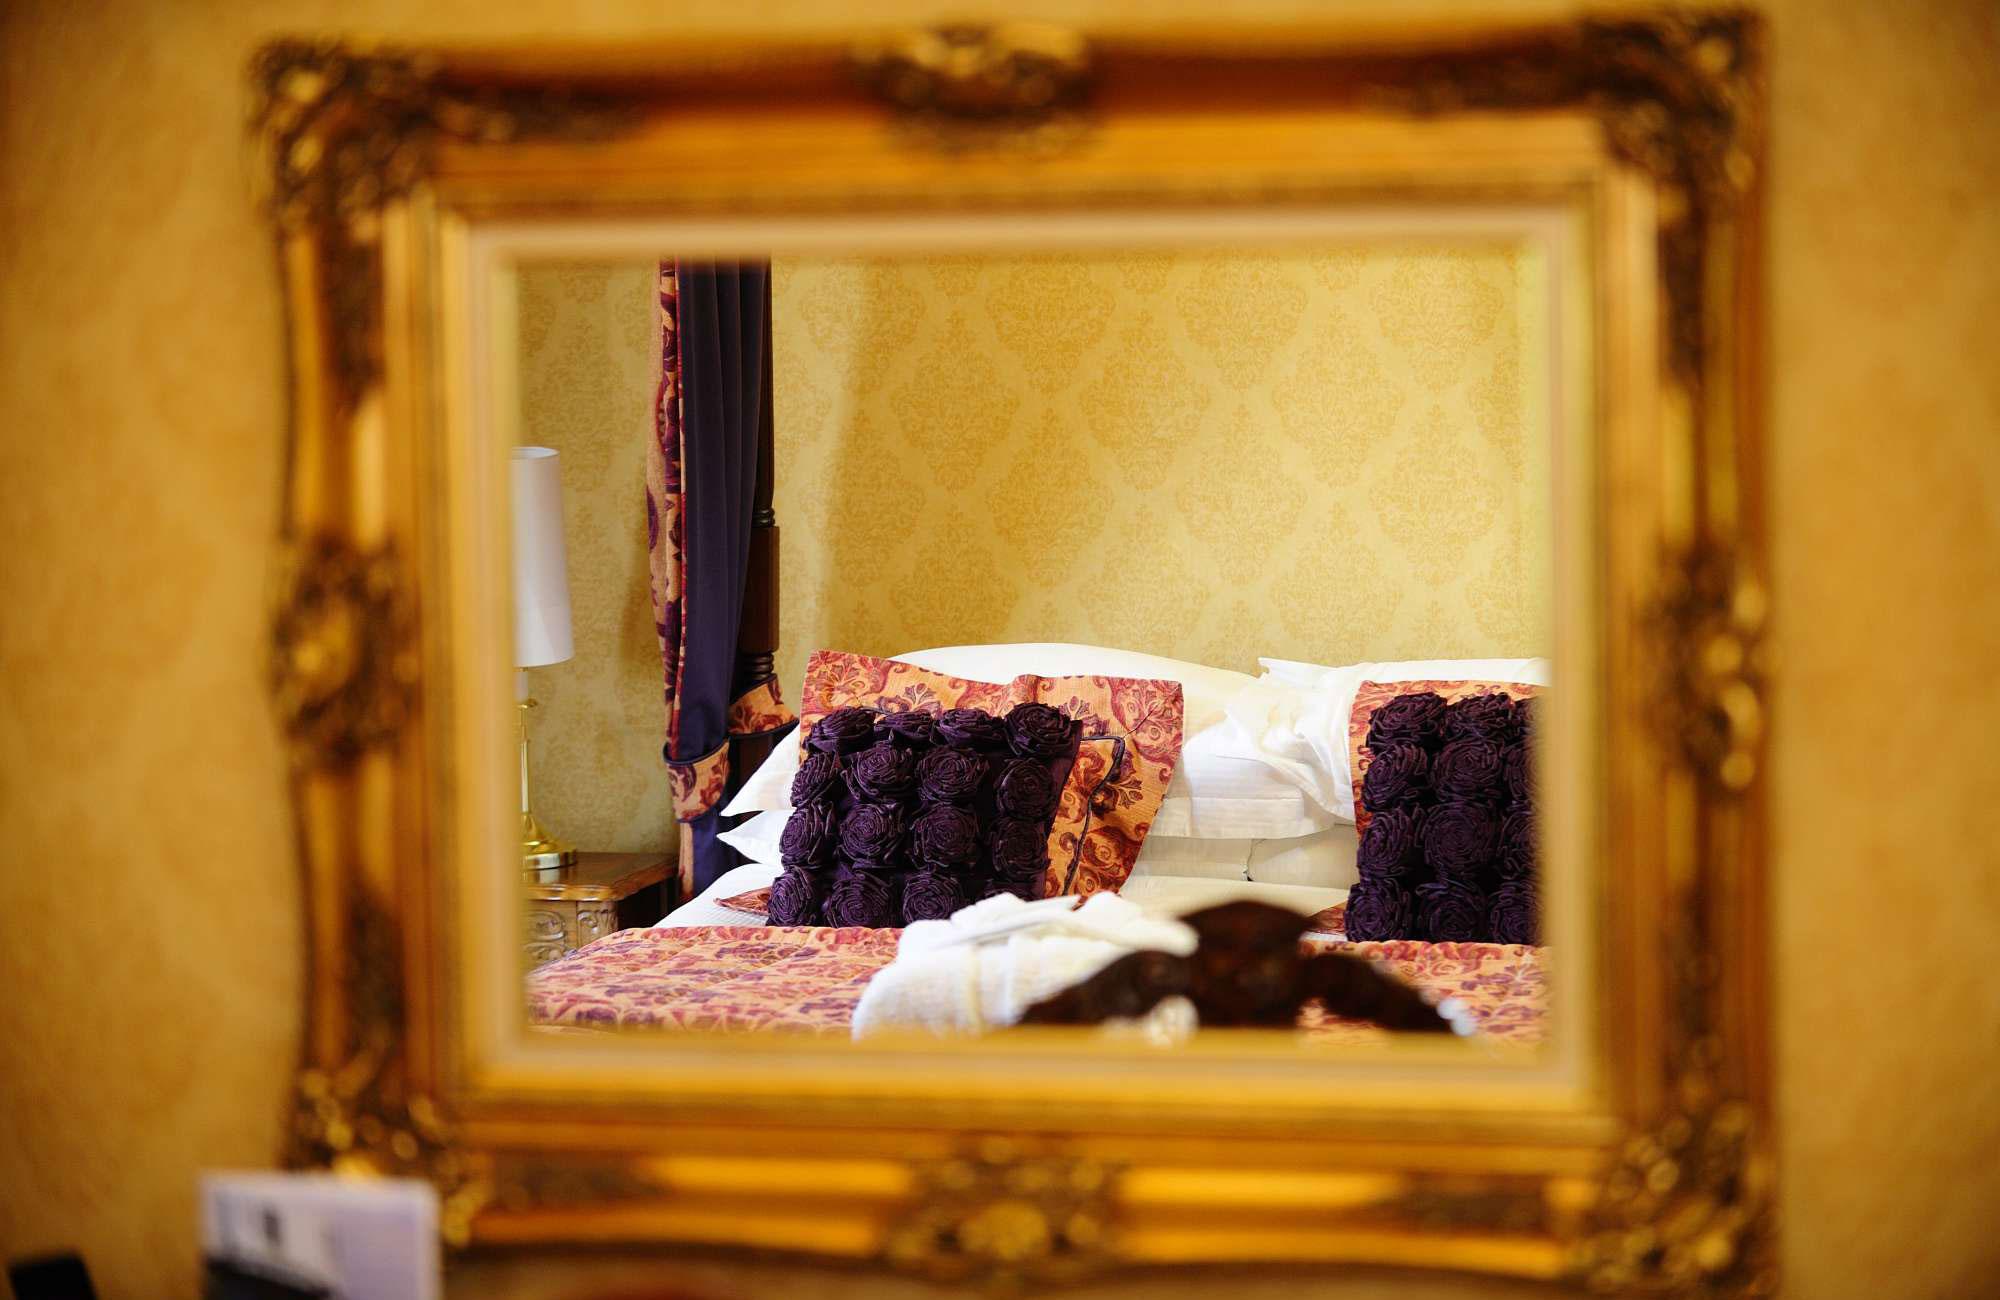 short brakes in wales, lampeter hotels, pet friendly hotels wales